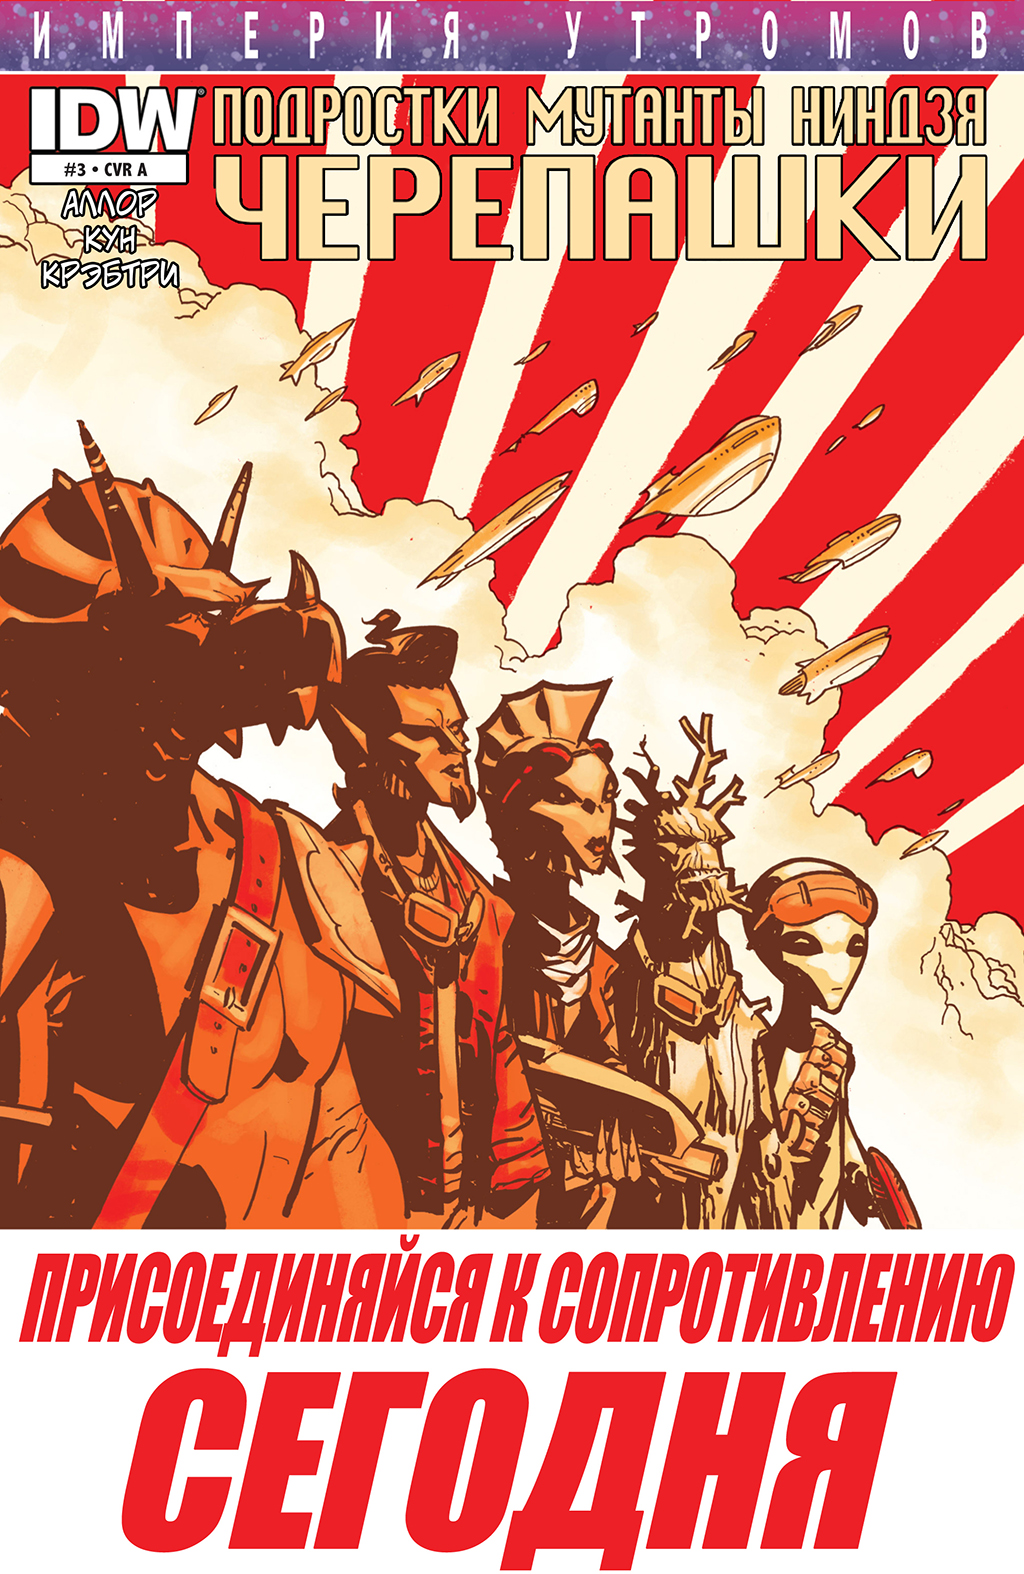 Комикс Подростки Мутанты Ниндзя Черепашки: Империя Утромов